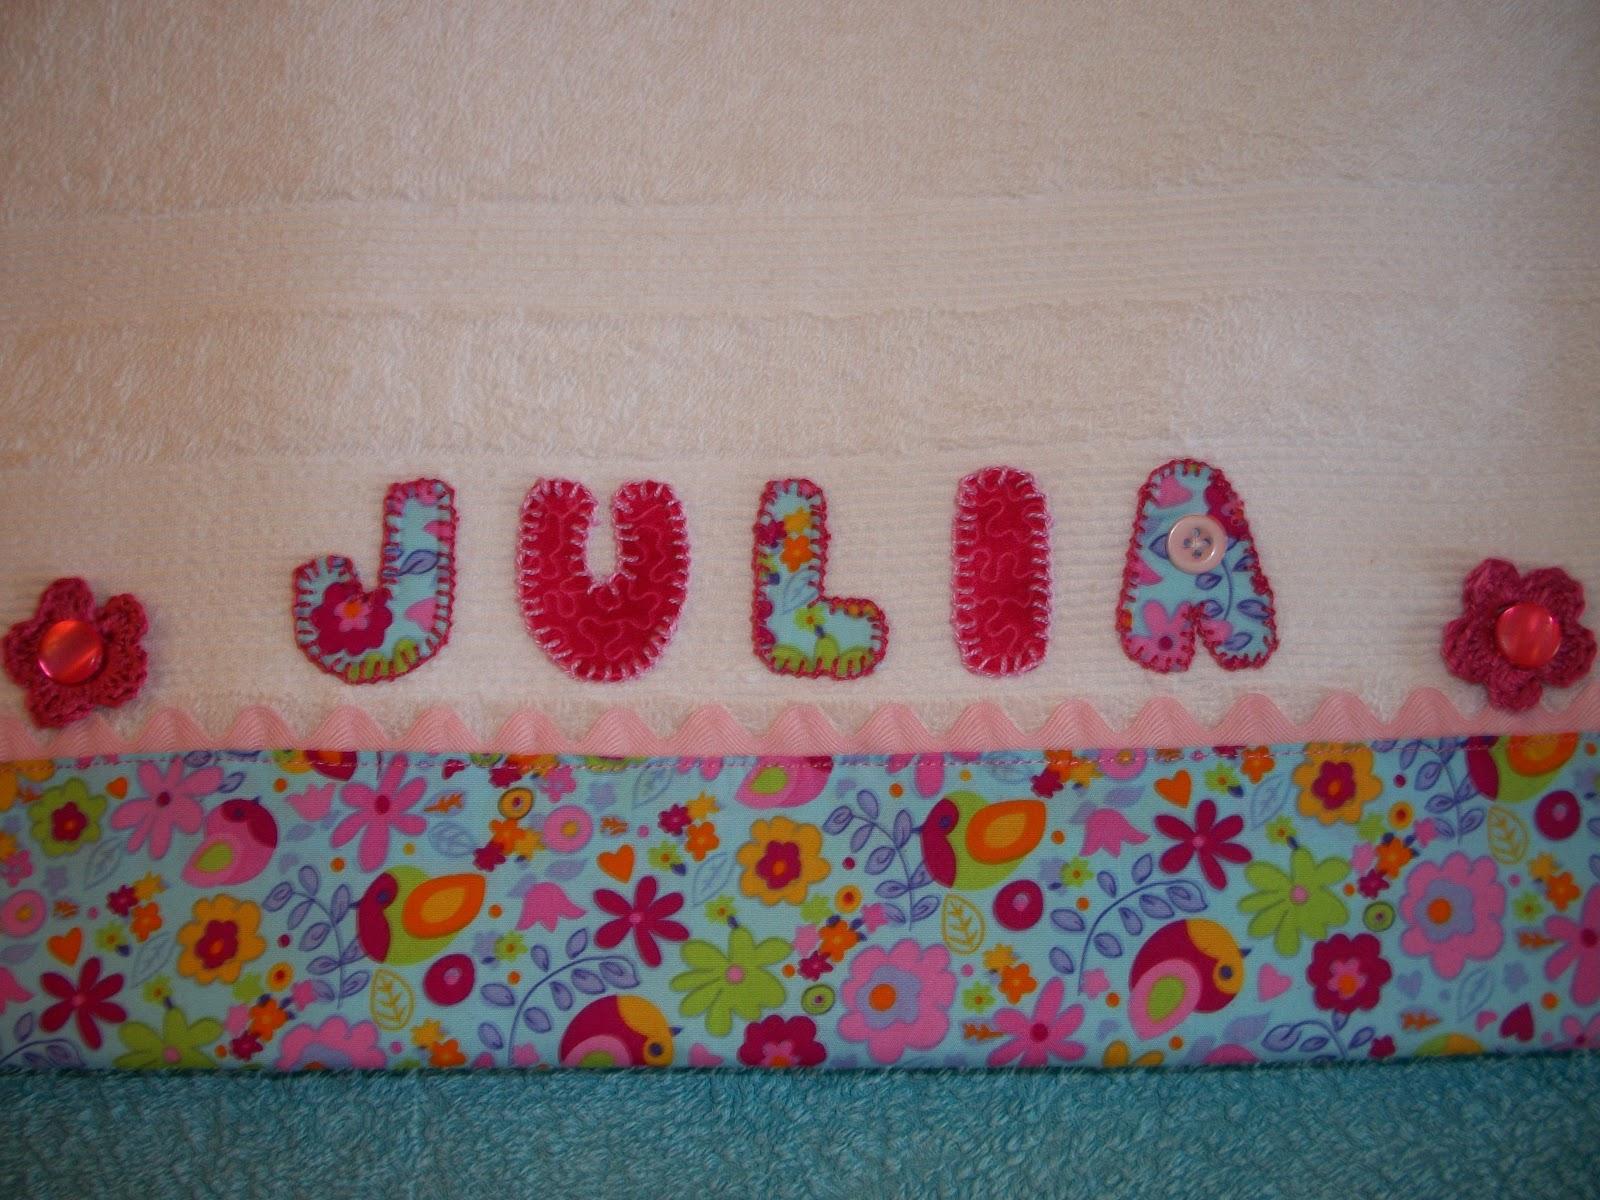 Toallas decoradas en patchwork imagui for Aplicaciones decoradas